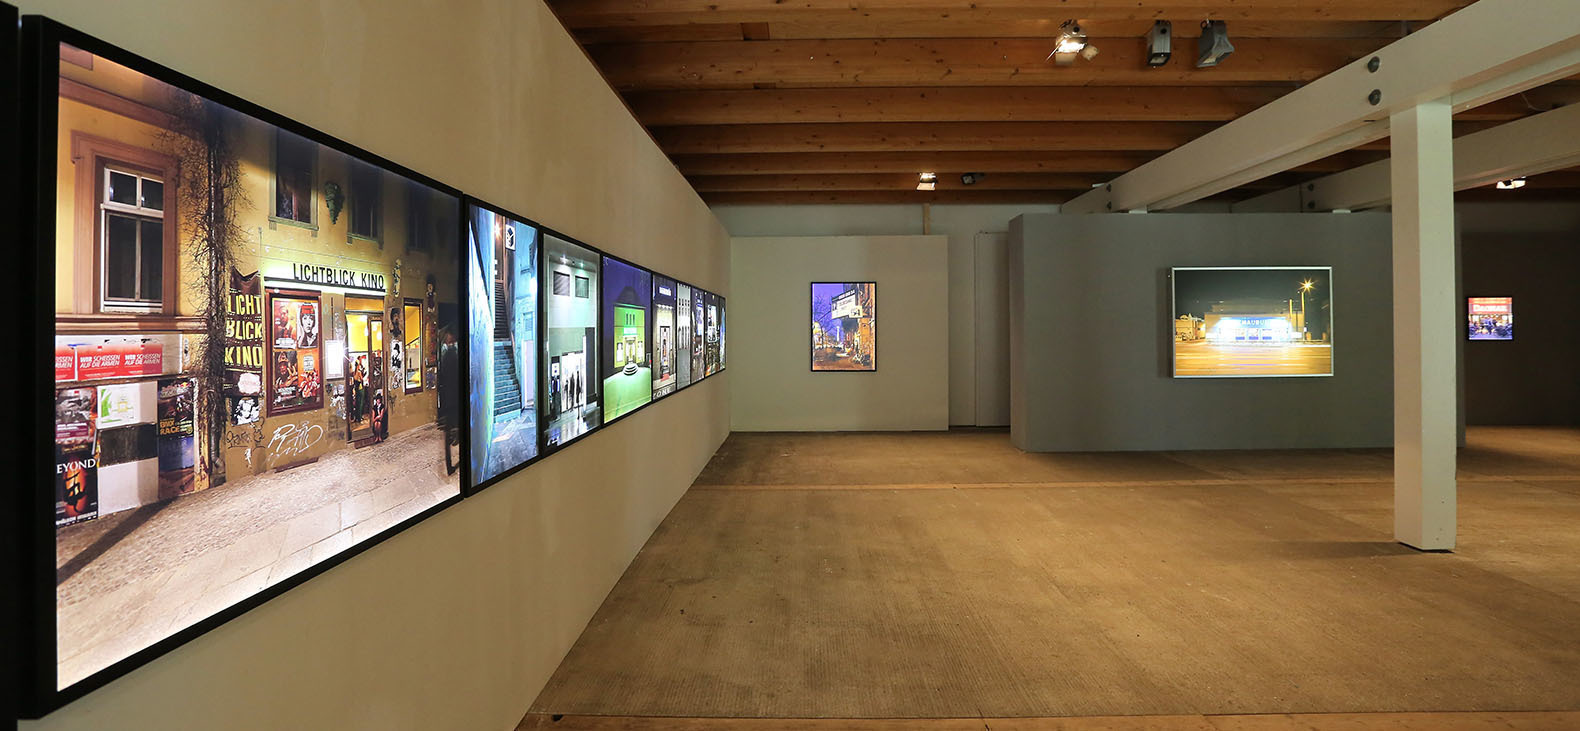 Richard Thieler: Kino, Schafhof 2016